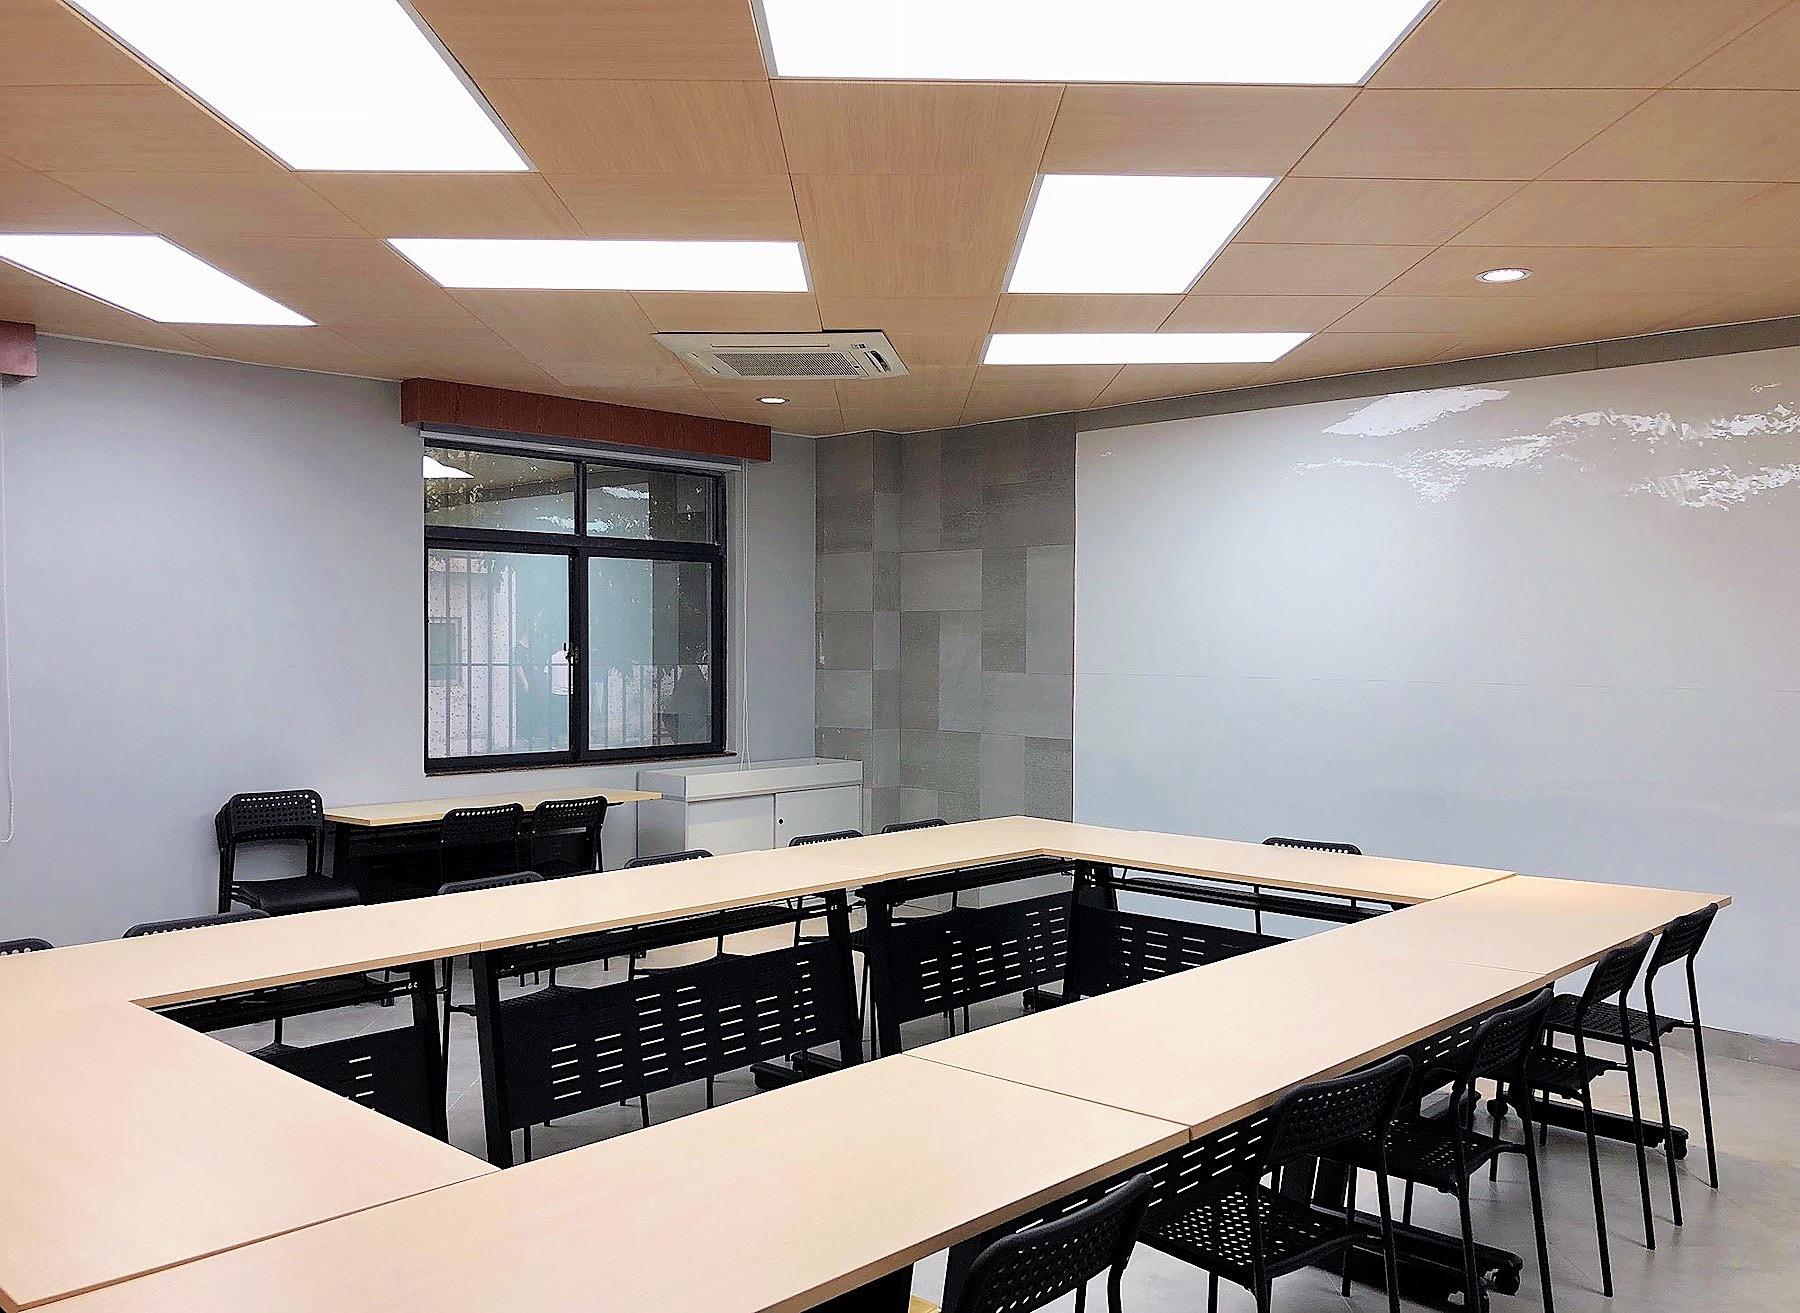 Grandway Office Renovation 2018 Multi Function Room 02 004